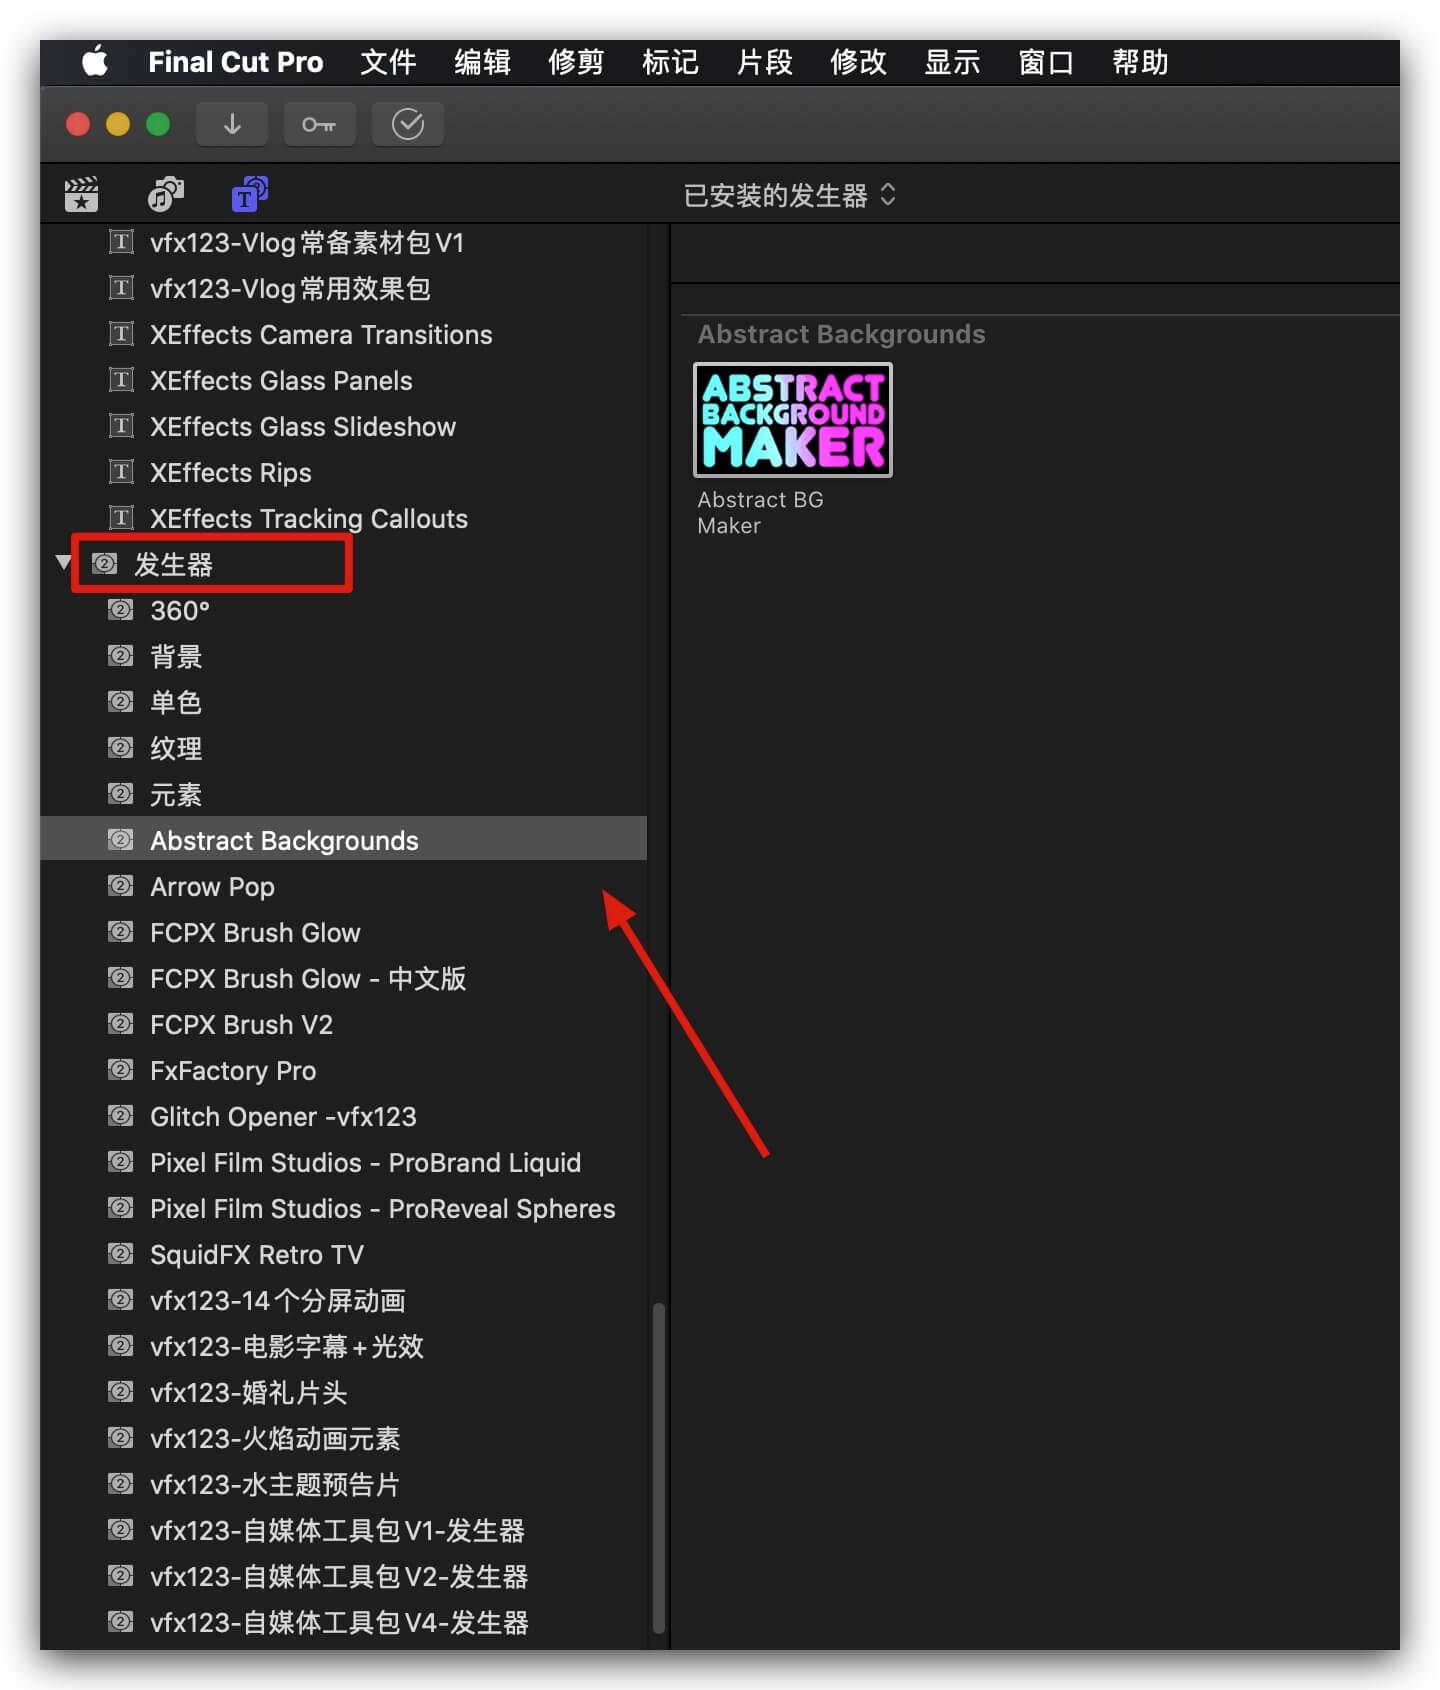 fcpx插件 抽象动态背景彩色标题生成工具 Abstract Background Maker